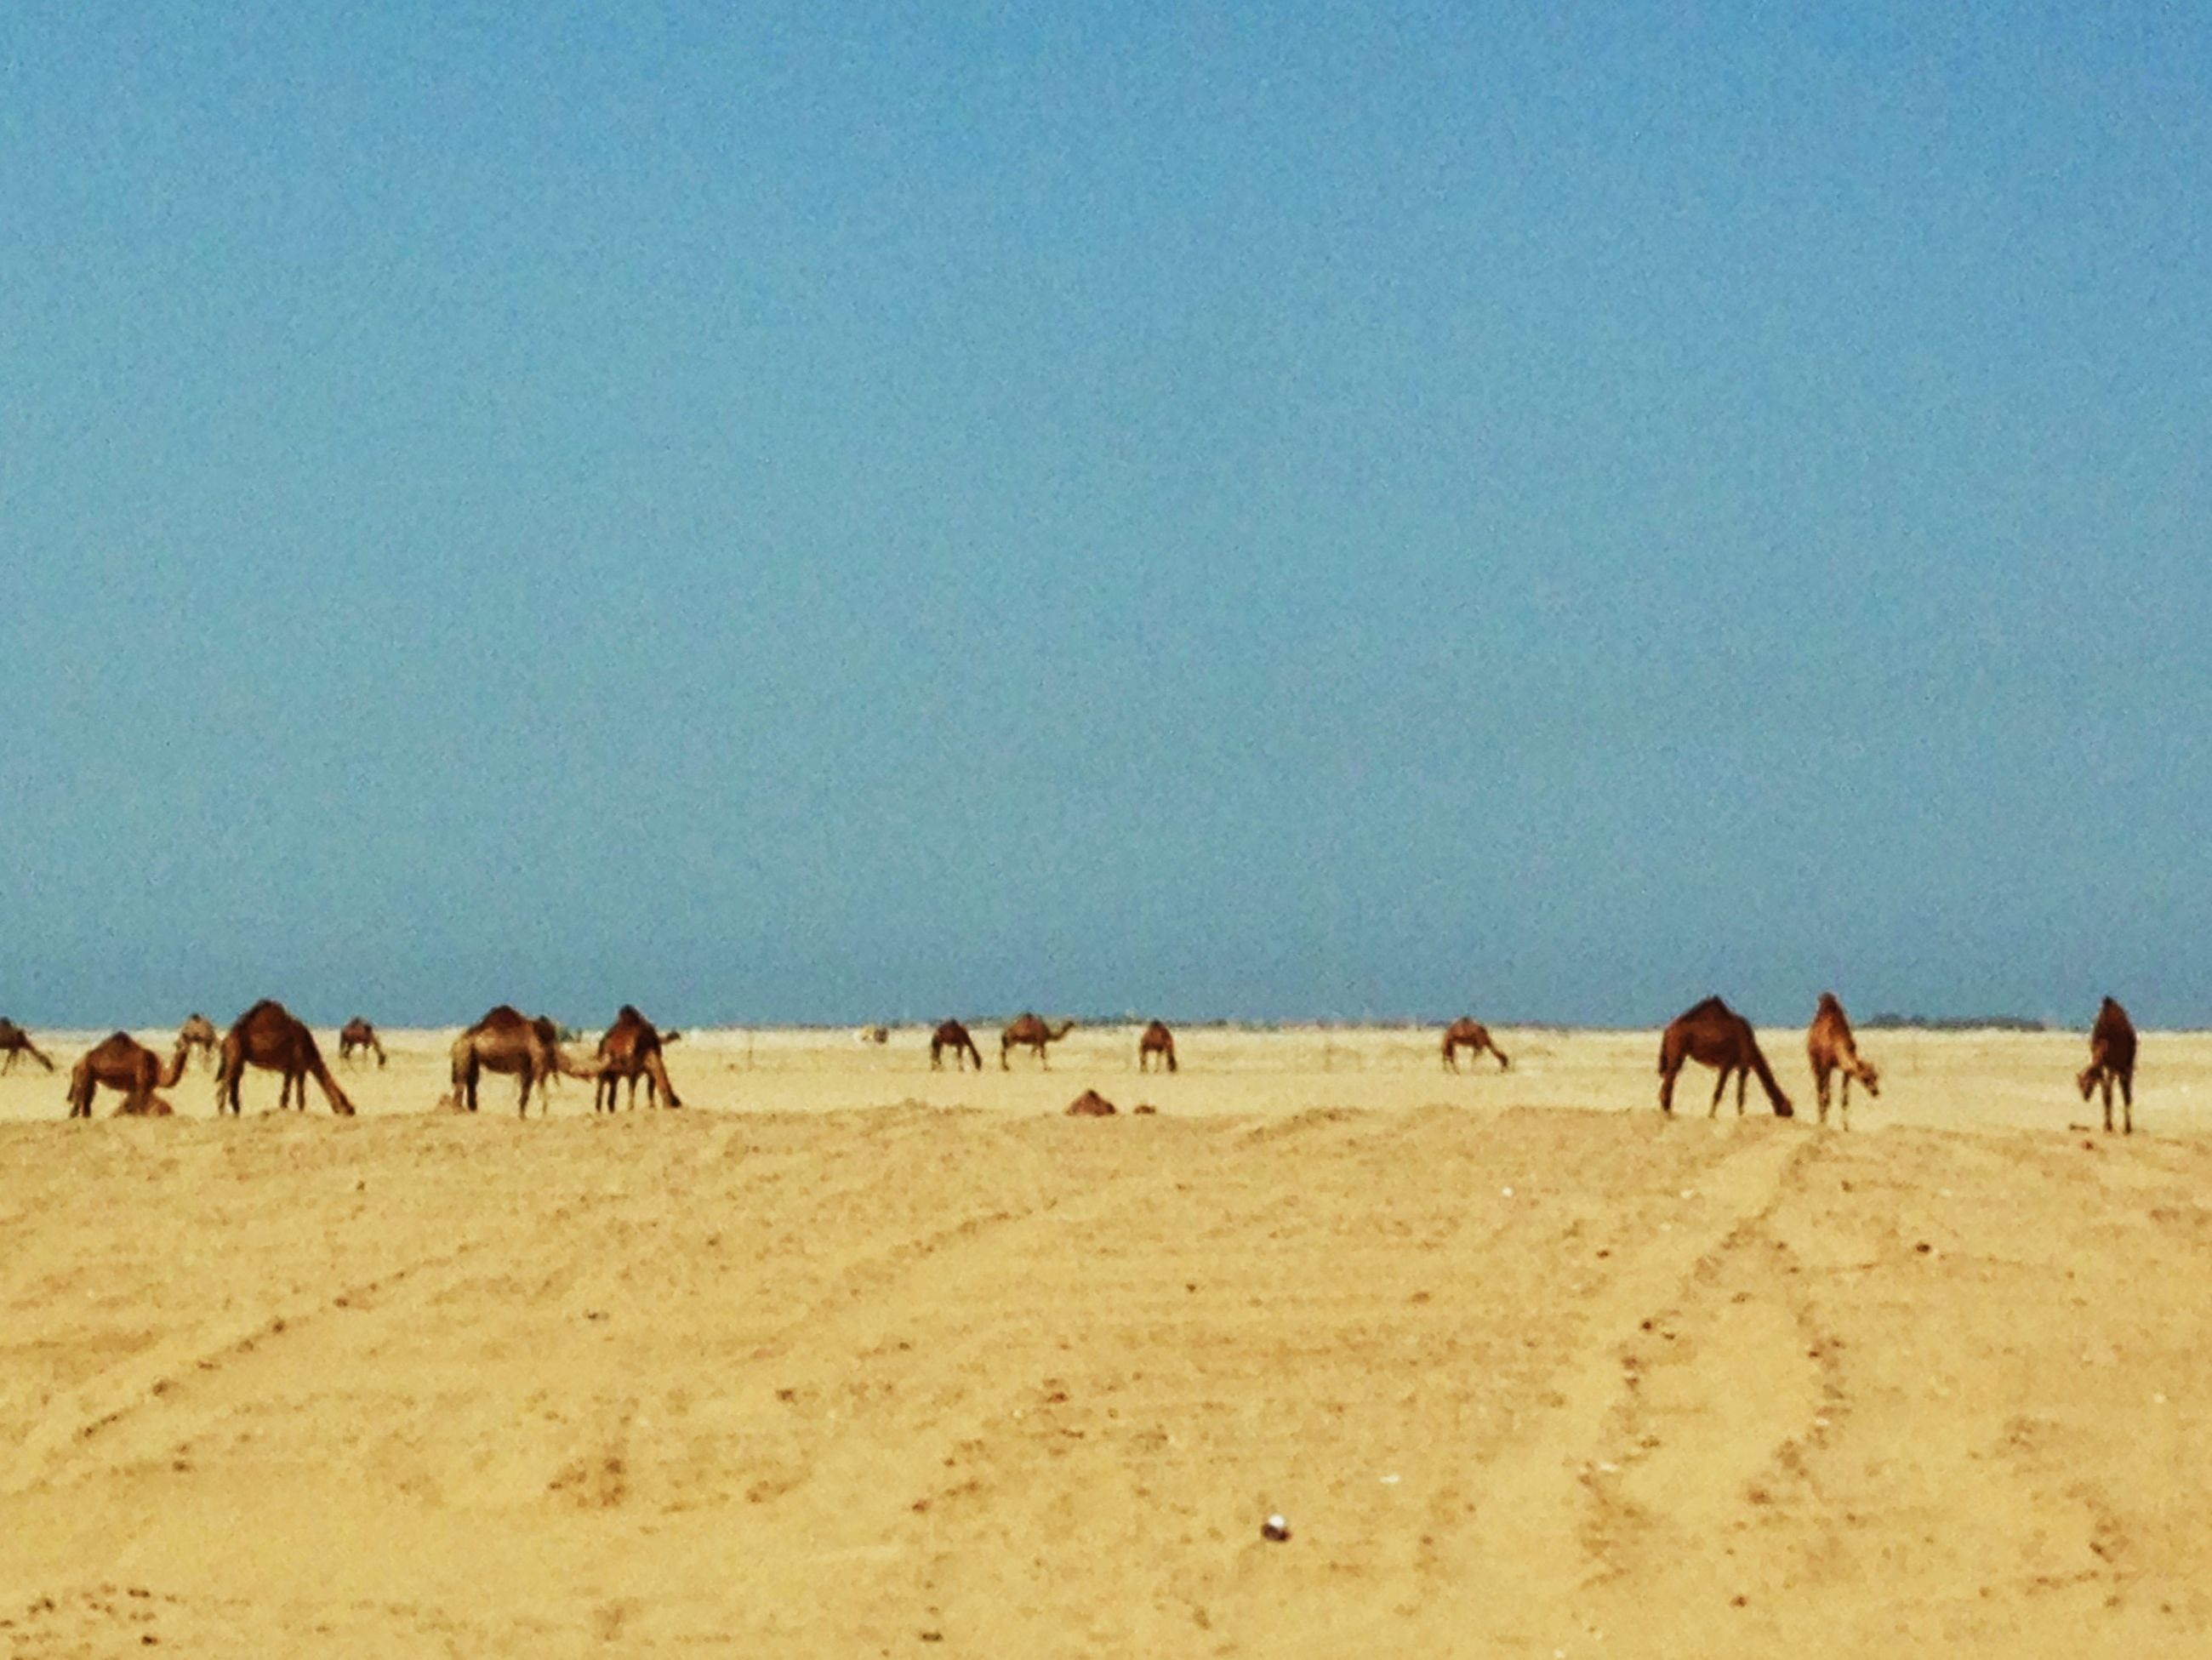 animal themes, domestic animals, livestock, mammal, desert, sand, arid climate, horse, medium group of animals, clear sky, landscape, camel, copy space, herbivorous, herd, working animal, nature, sand dune, zoology